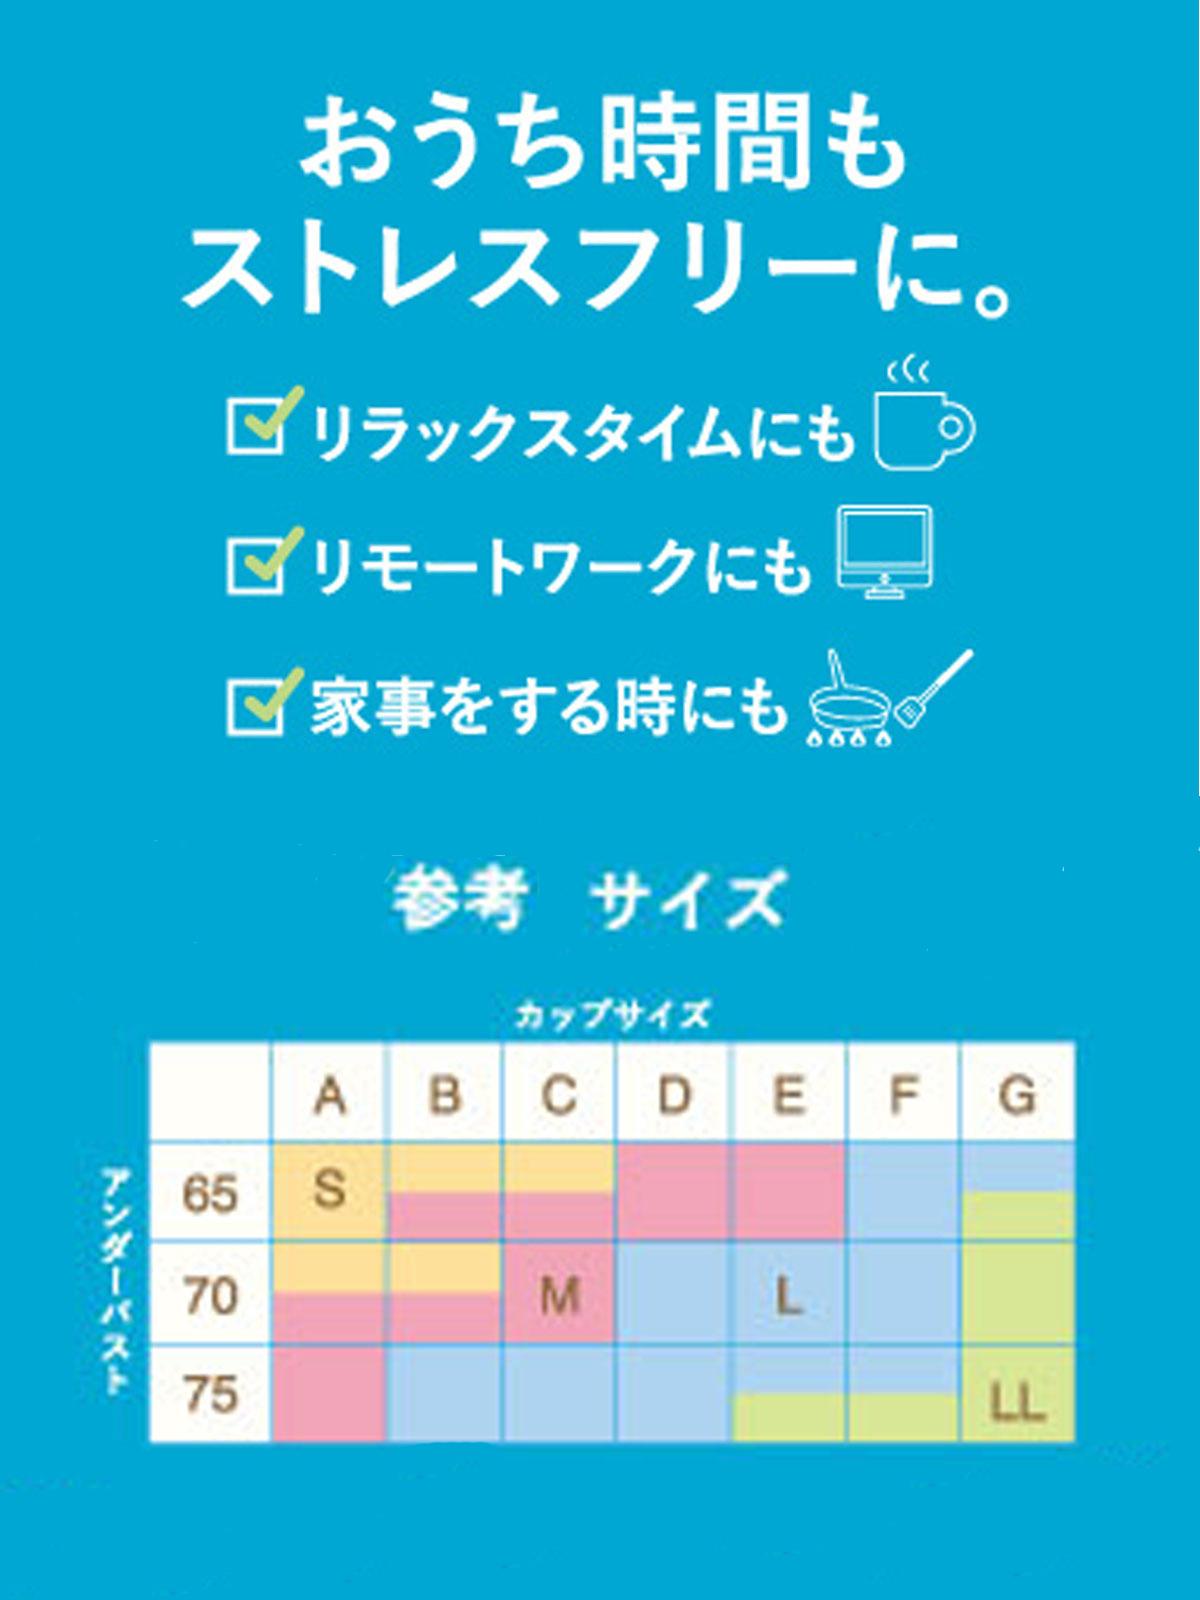 [tutu free]ノンワイヤーブラ(無地)